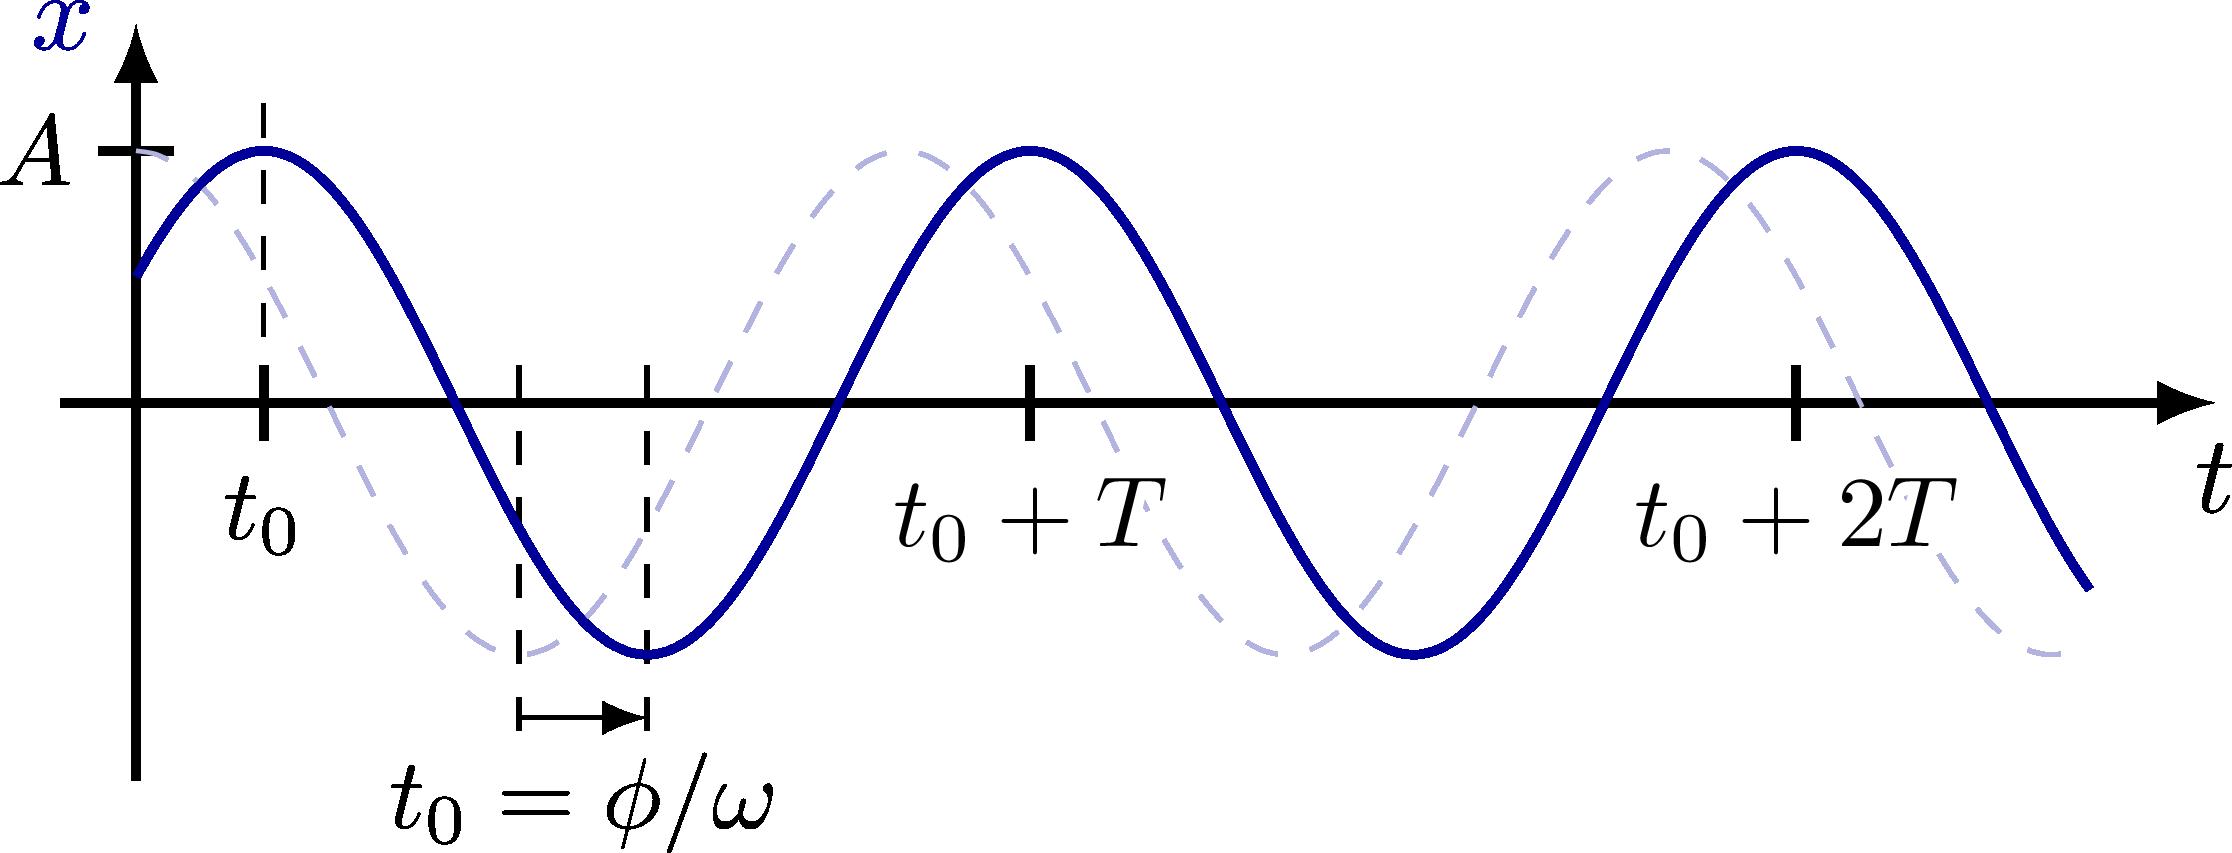 dynamics_oscillator-004.png